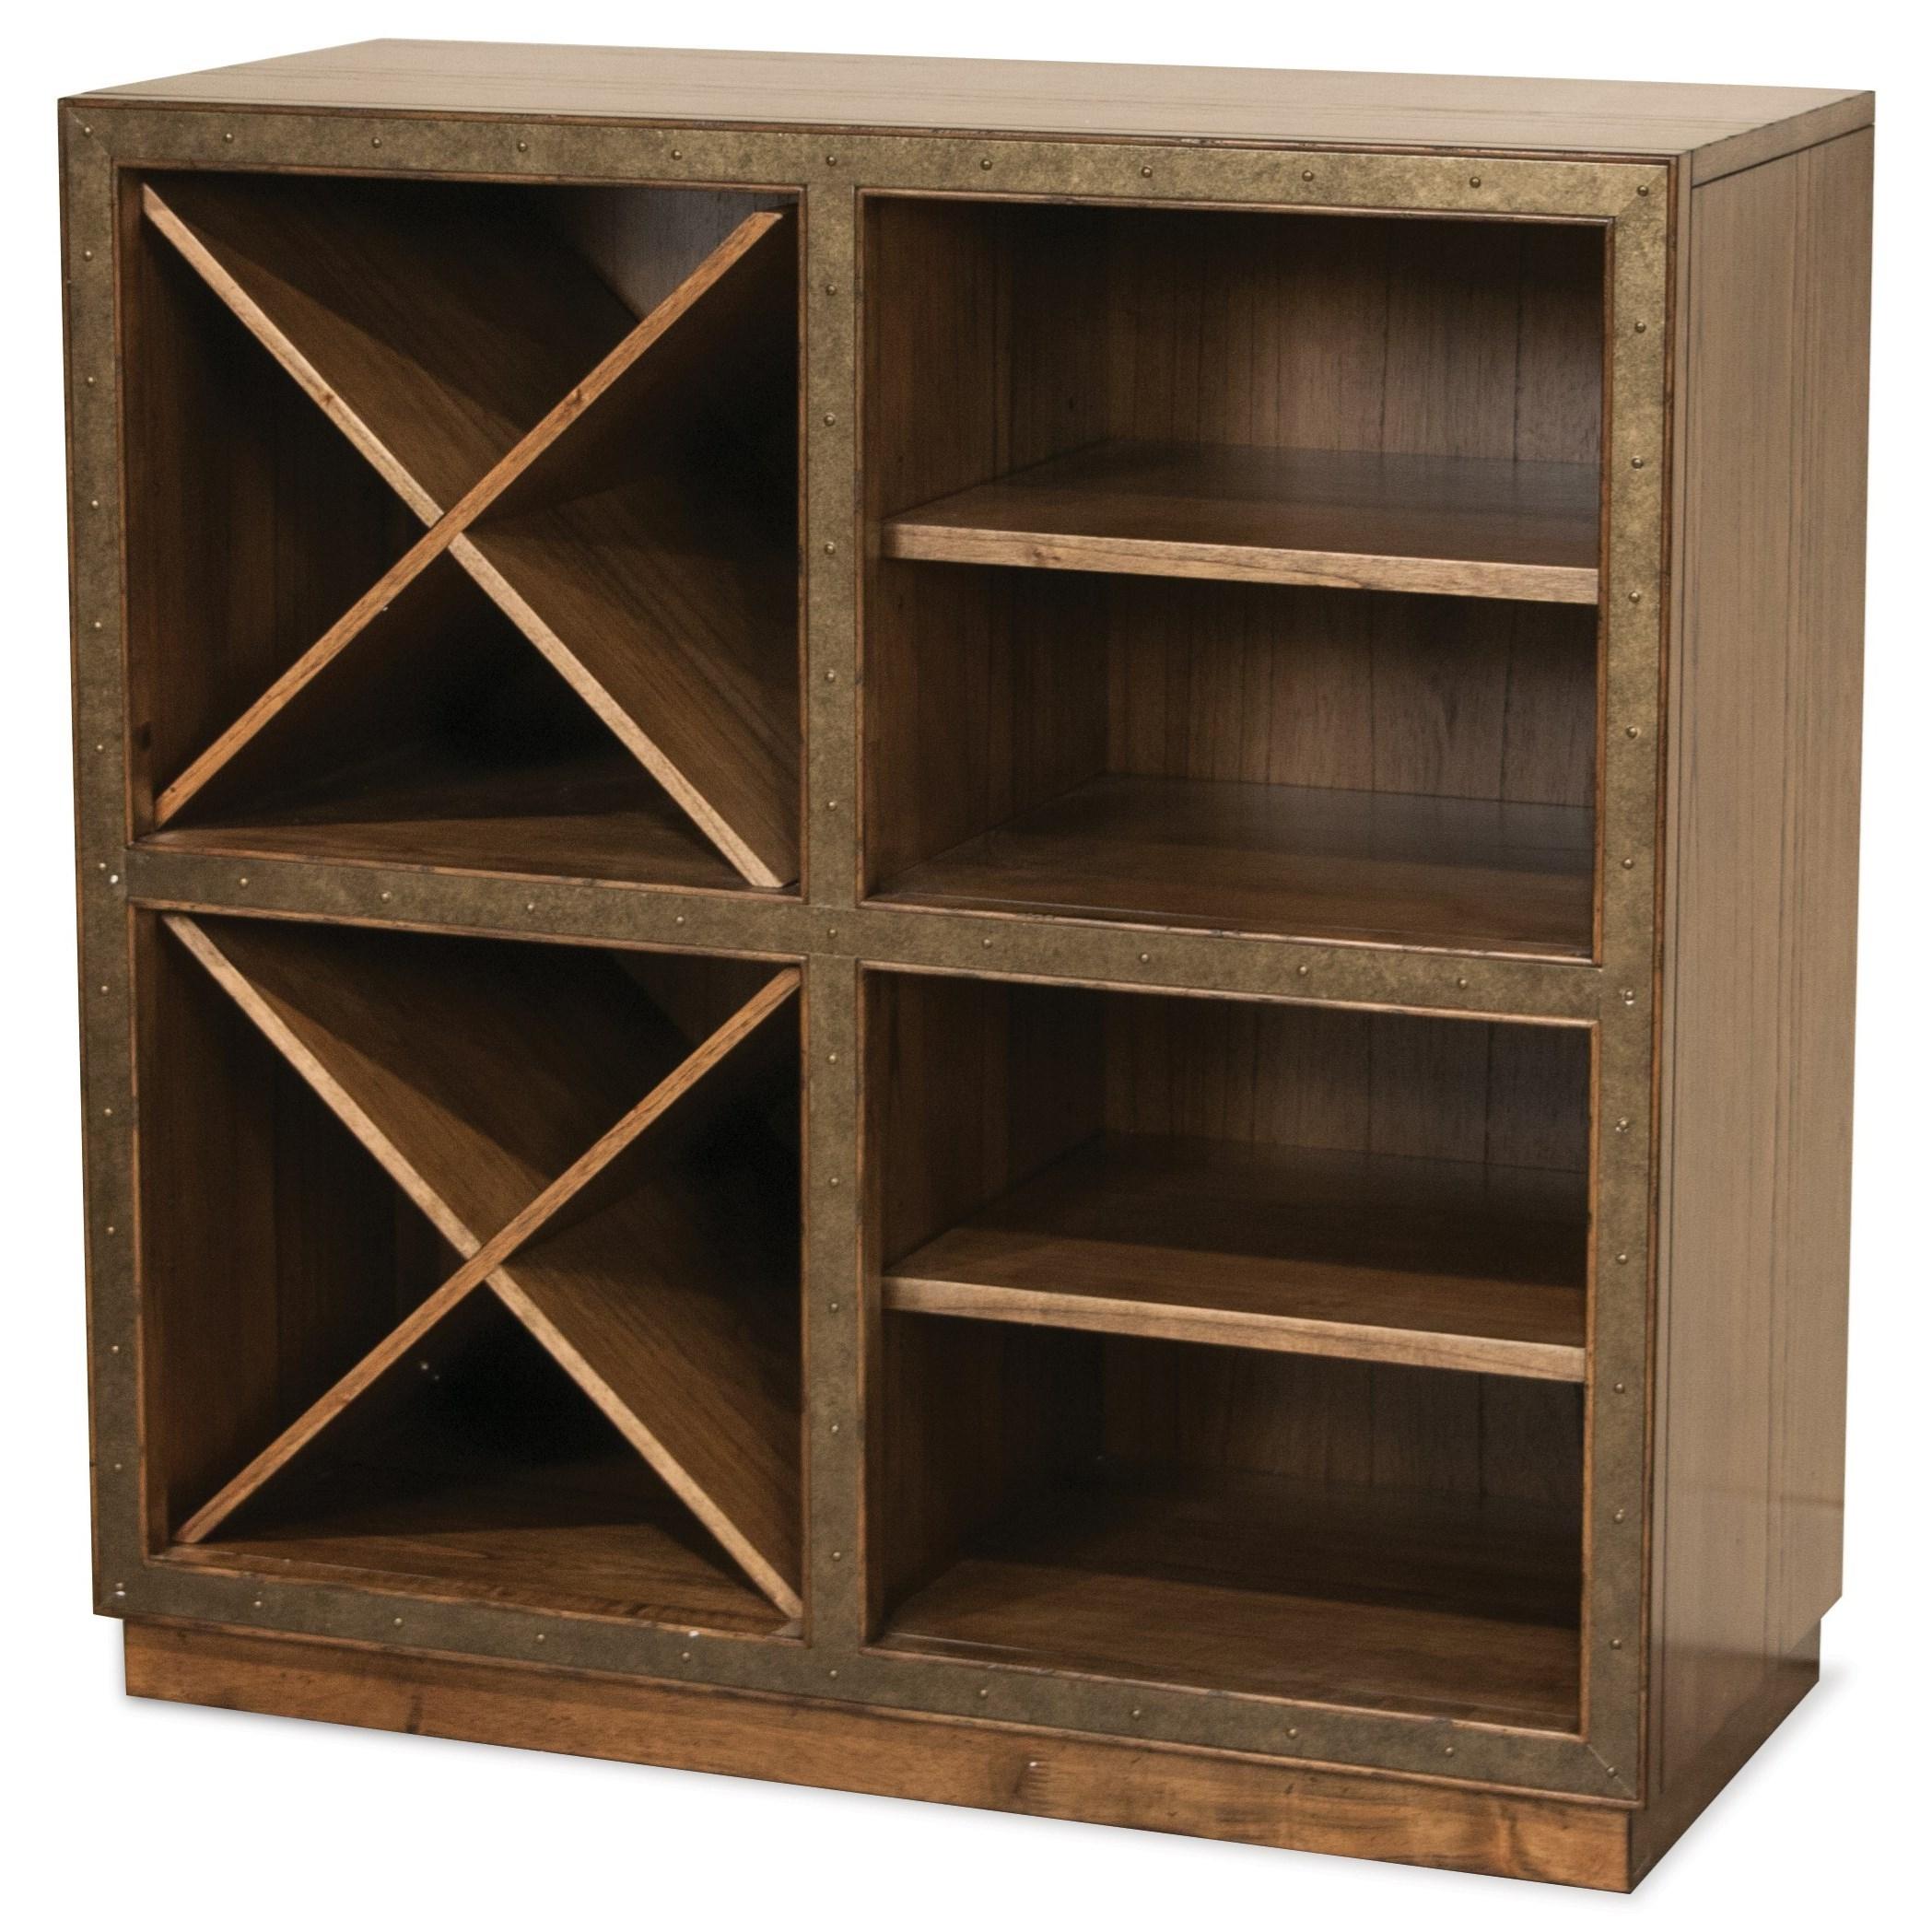 Riverside Furniture Falls Creek Open Storage Unit - Item Number: 16148